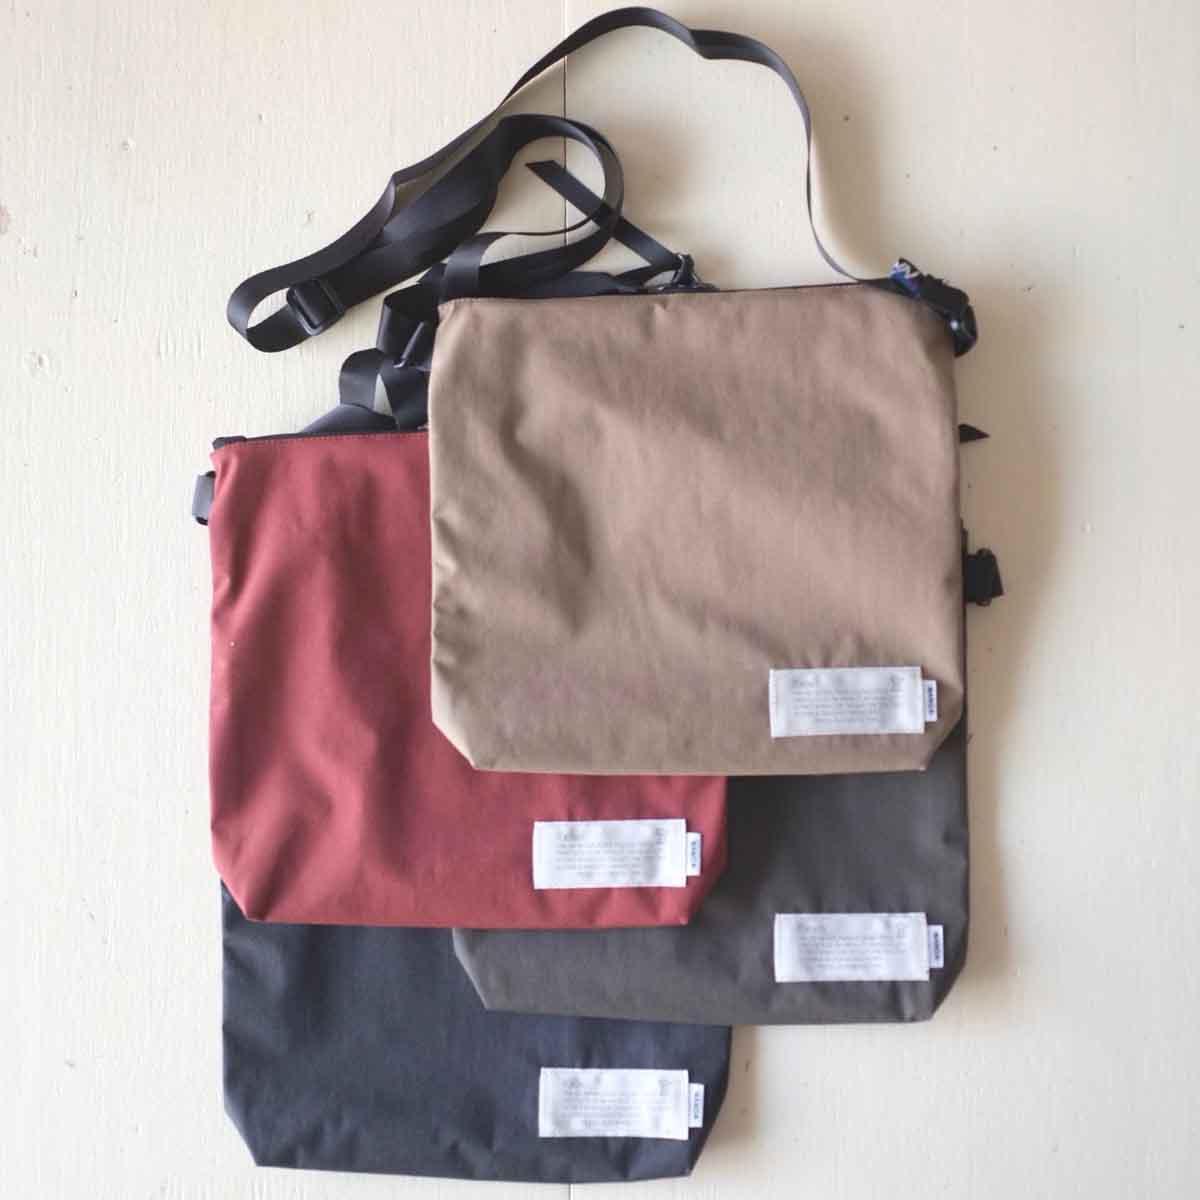 kelen ケレン x NANGA ナンガ Heckman ヘックマン sacoche サコッシュ 4 colors TAKIBI fabric使用